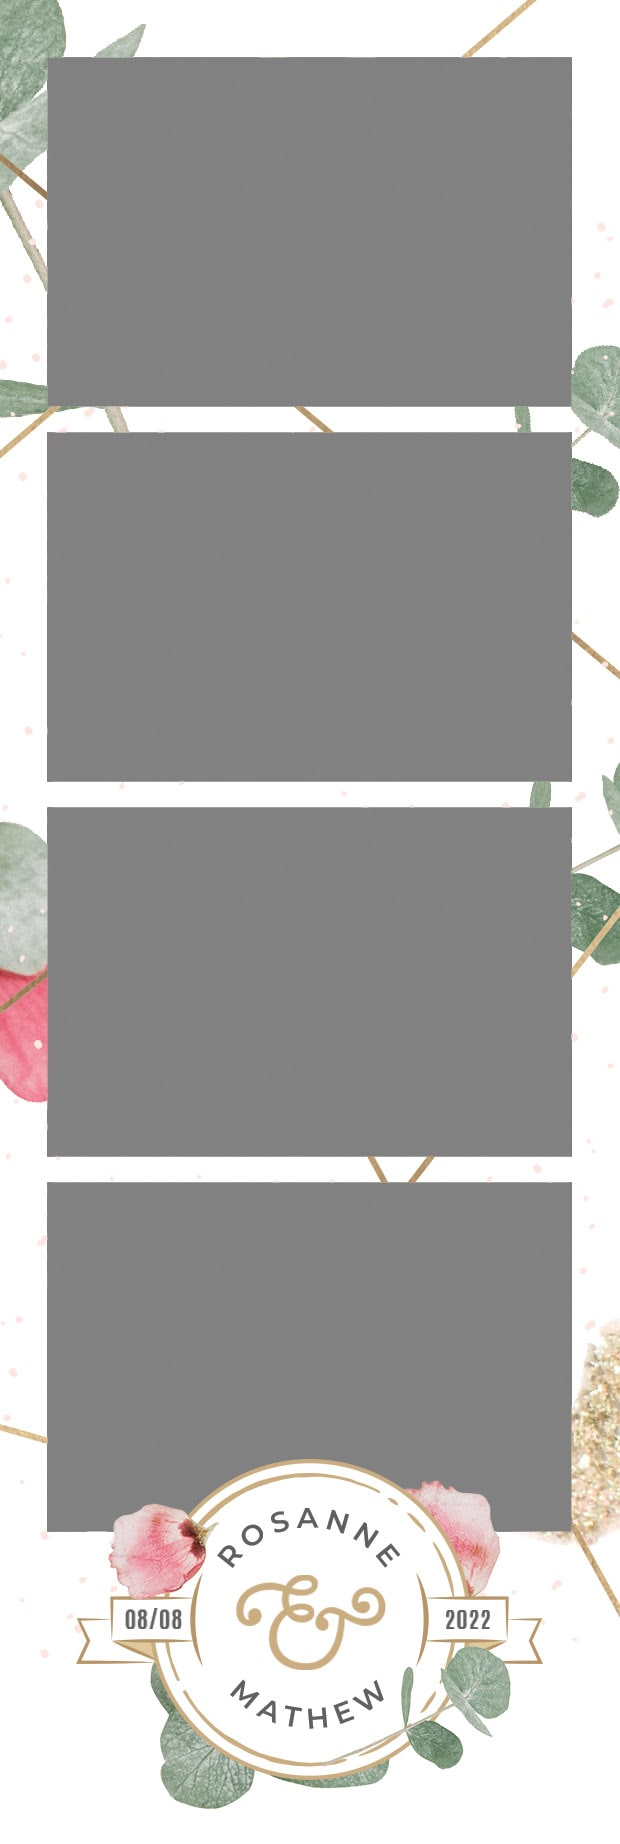 50 rustic flowers-min